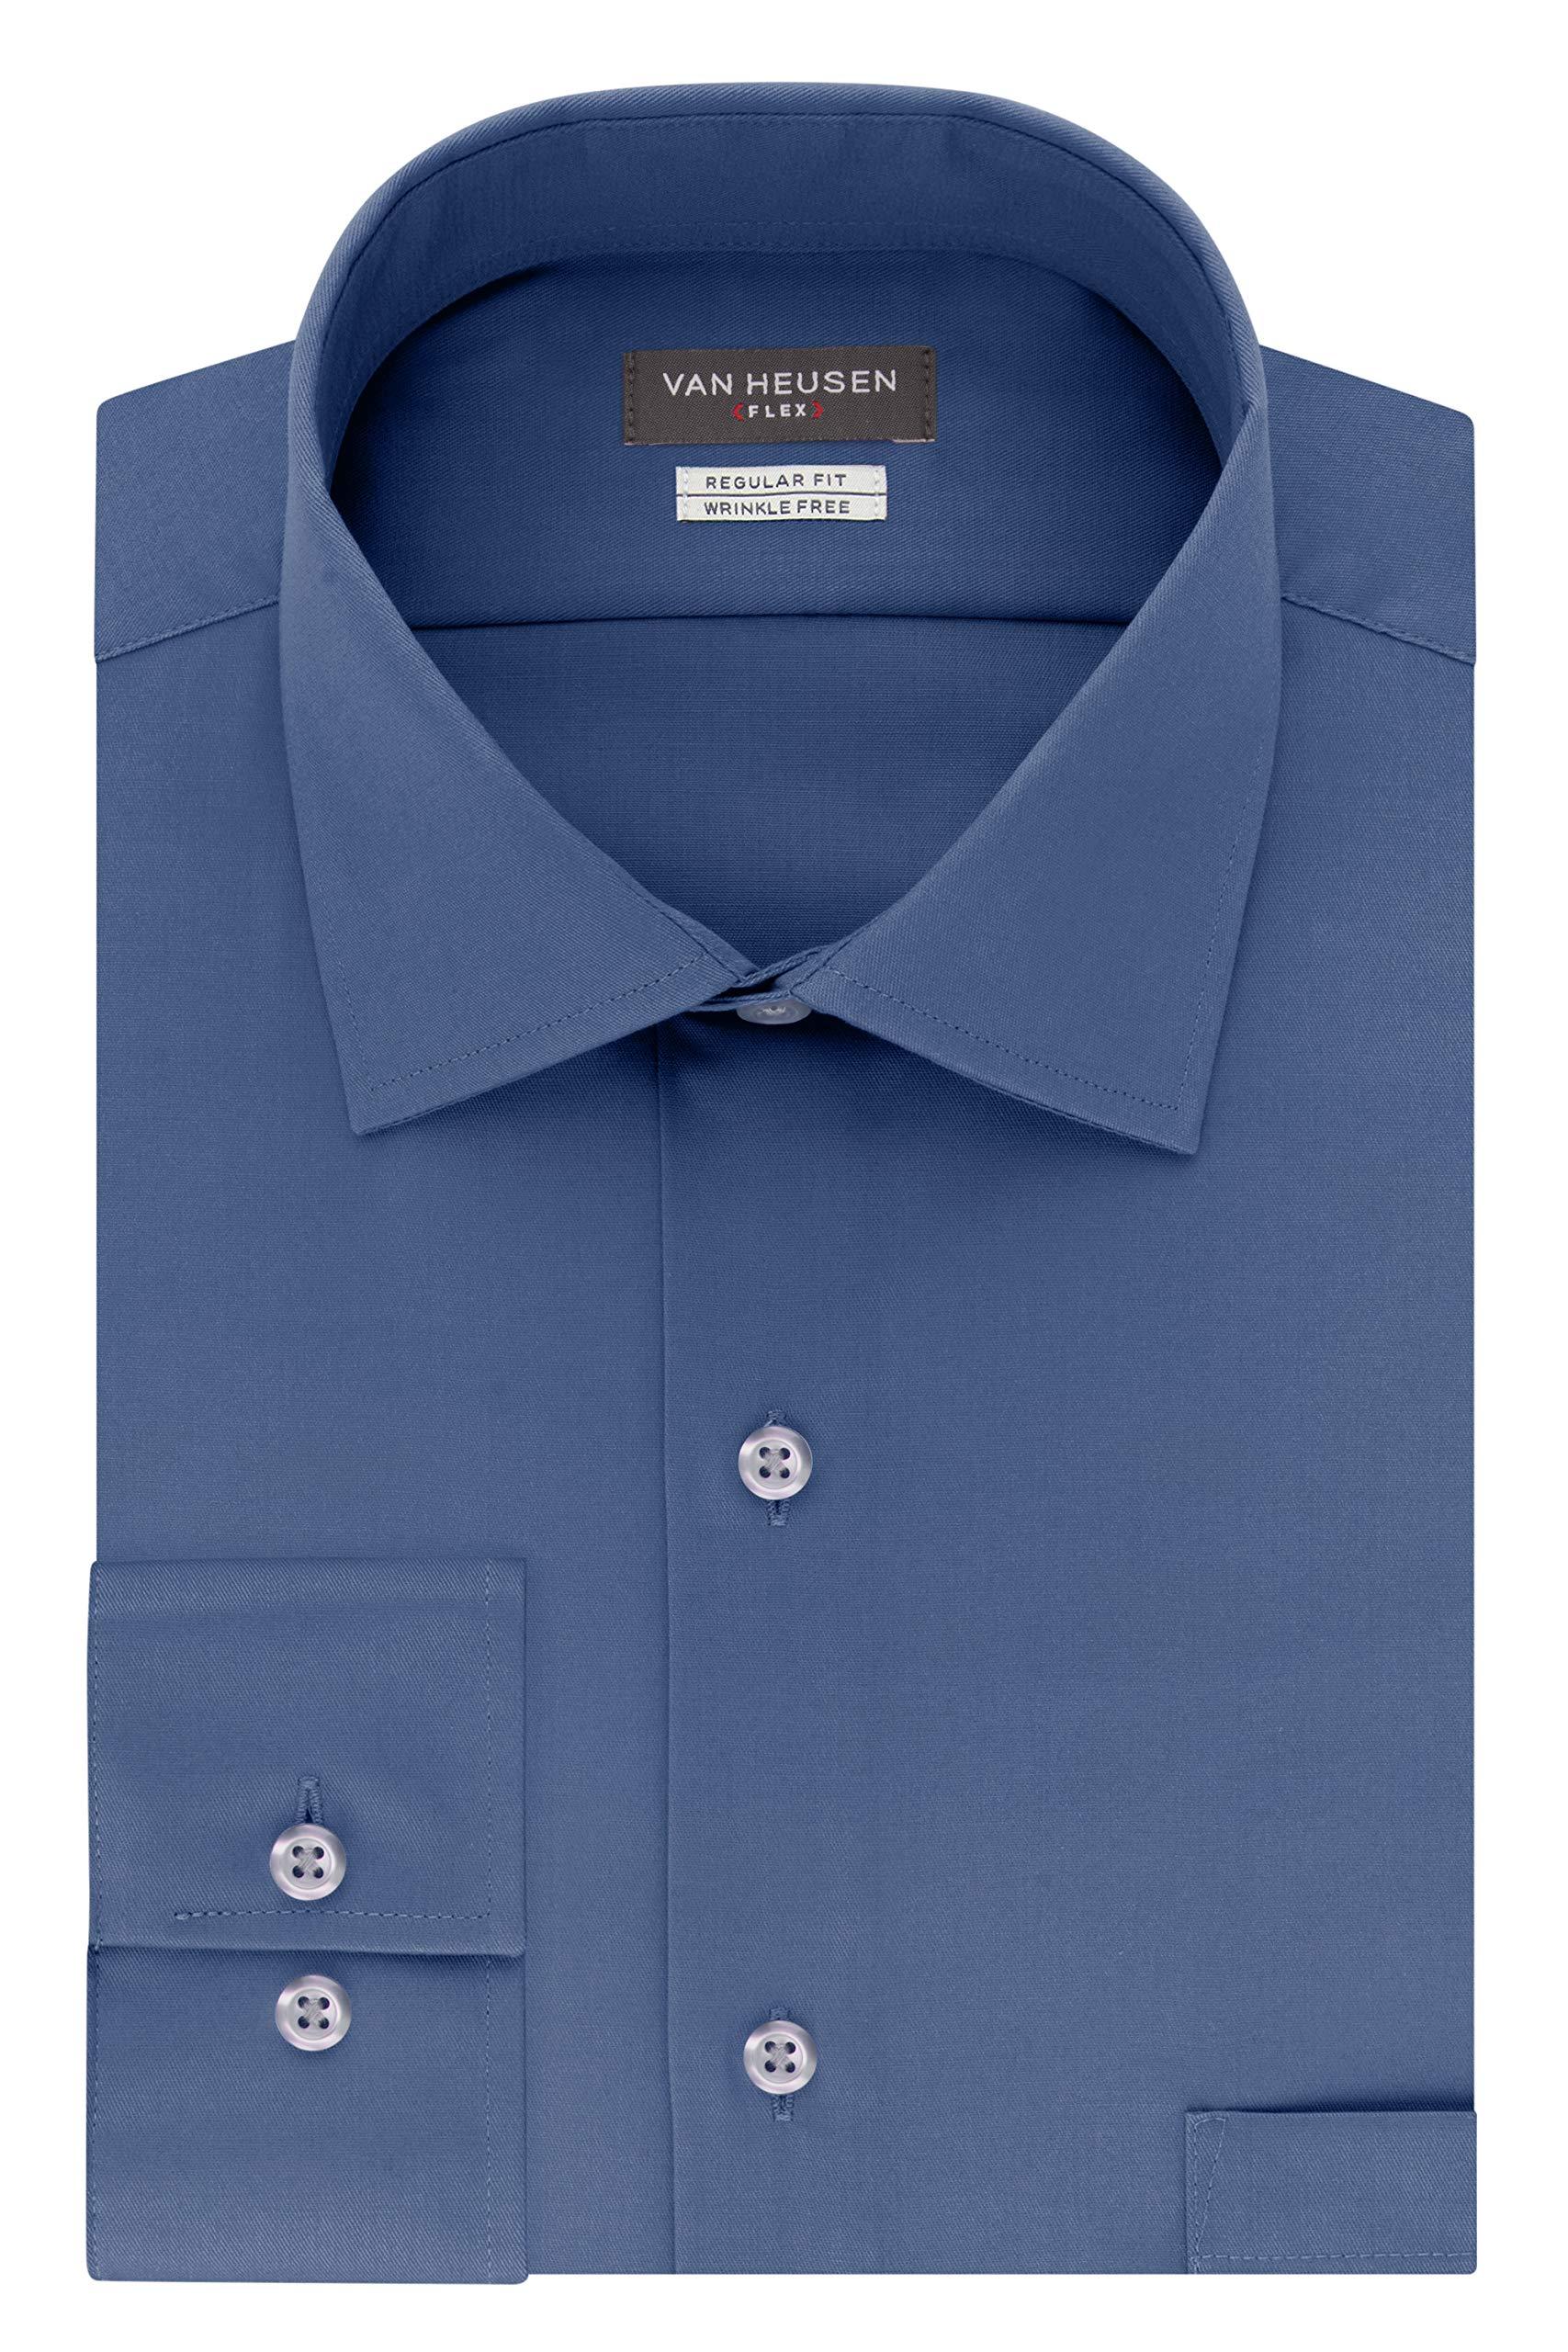 Van Heusen Men's Flex Regular Fit Solid Spread Collar Dress Shirt, Periwinkle, Dusty Blue, 16.5'' Neck 34''-35'' Sleeve